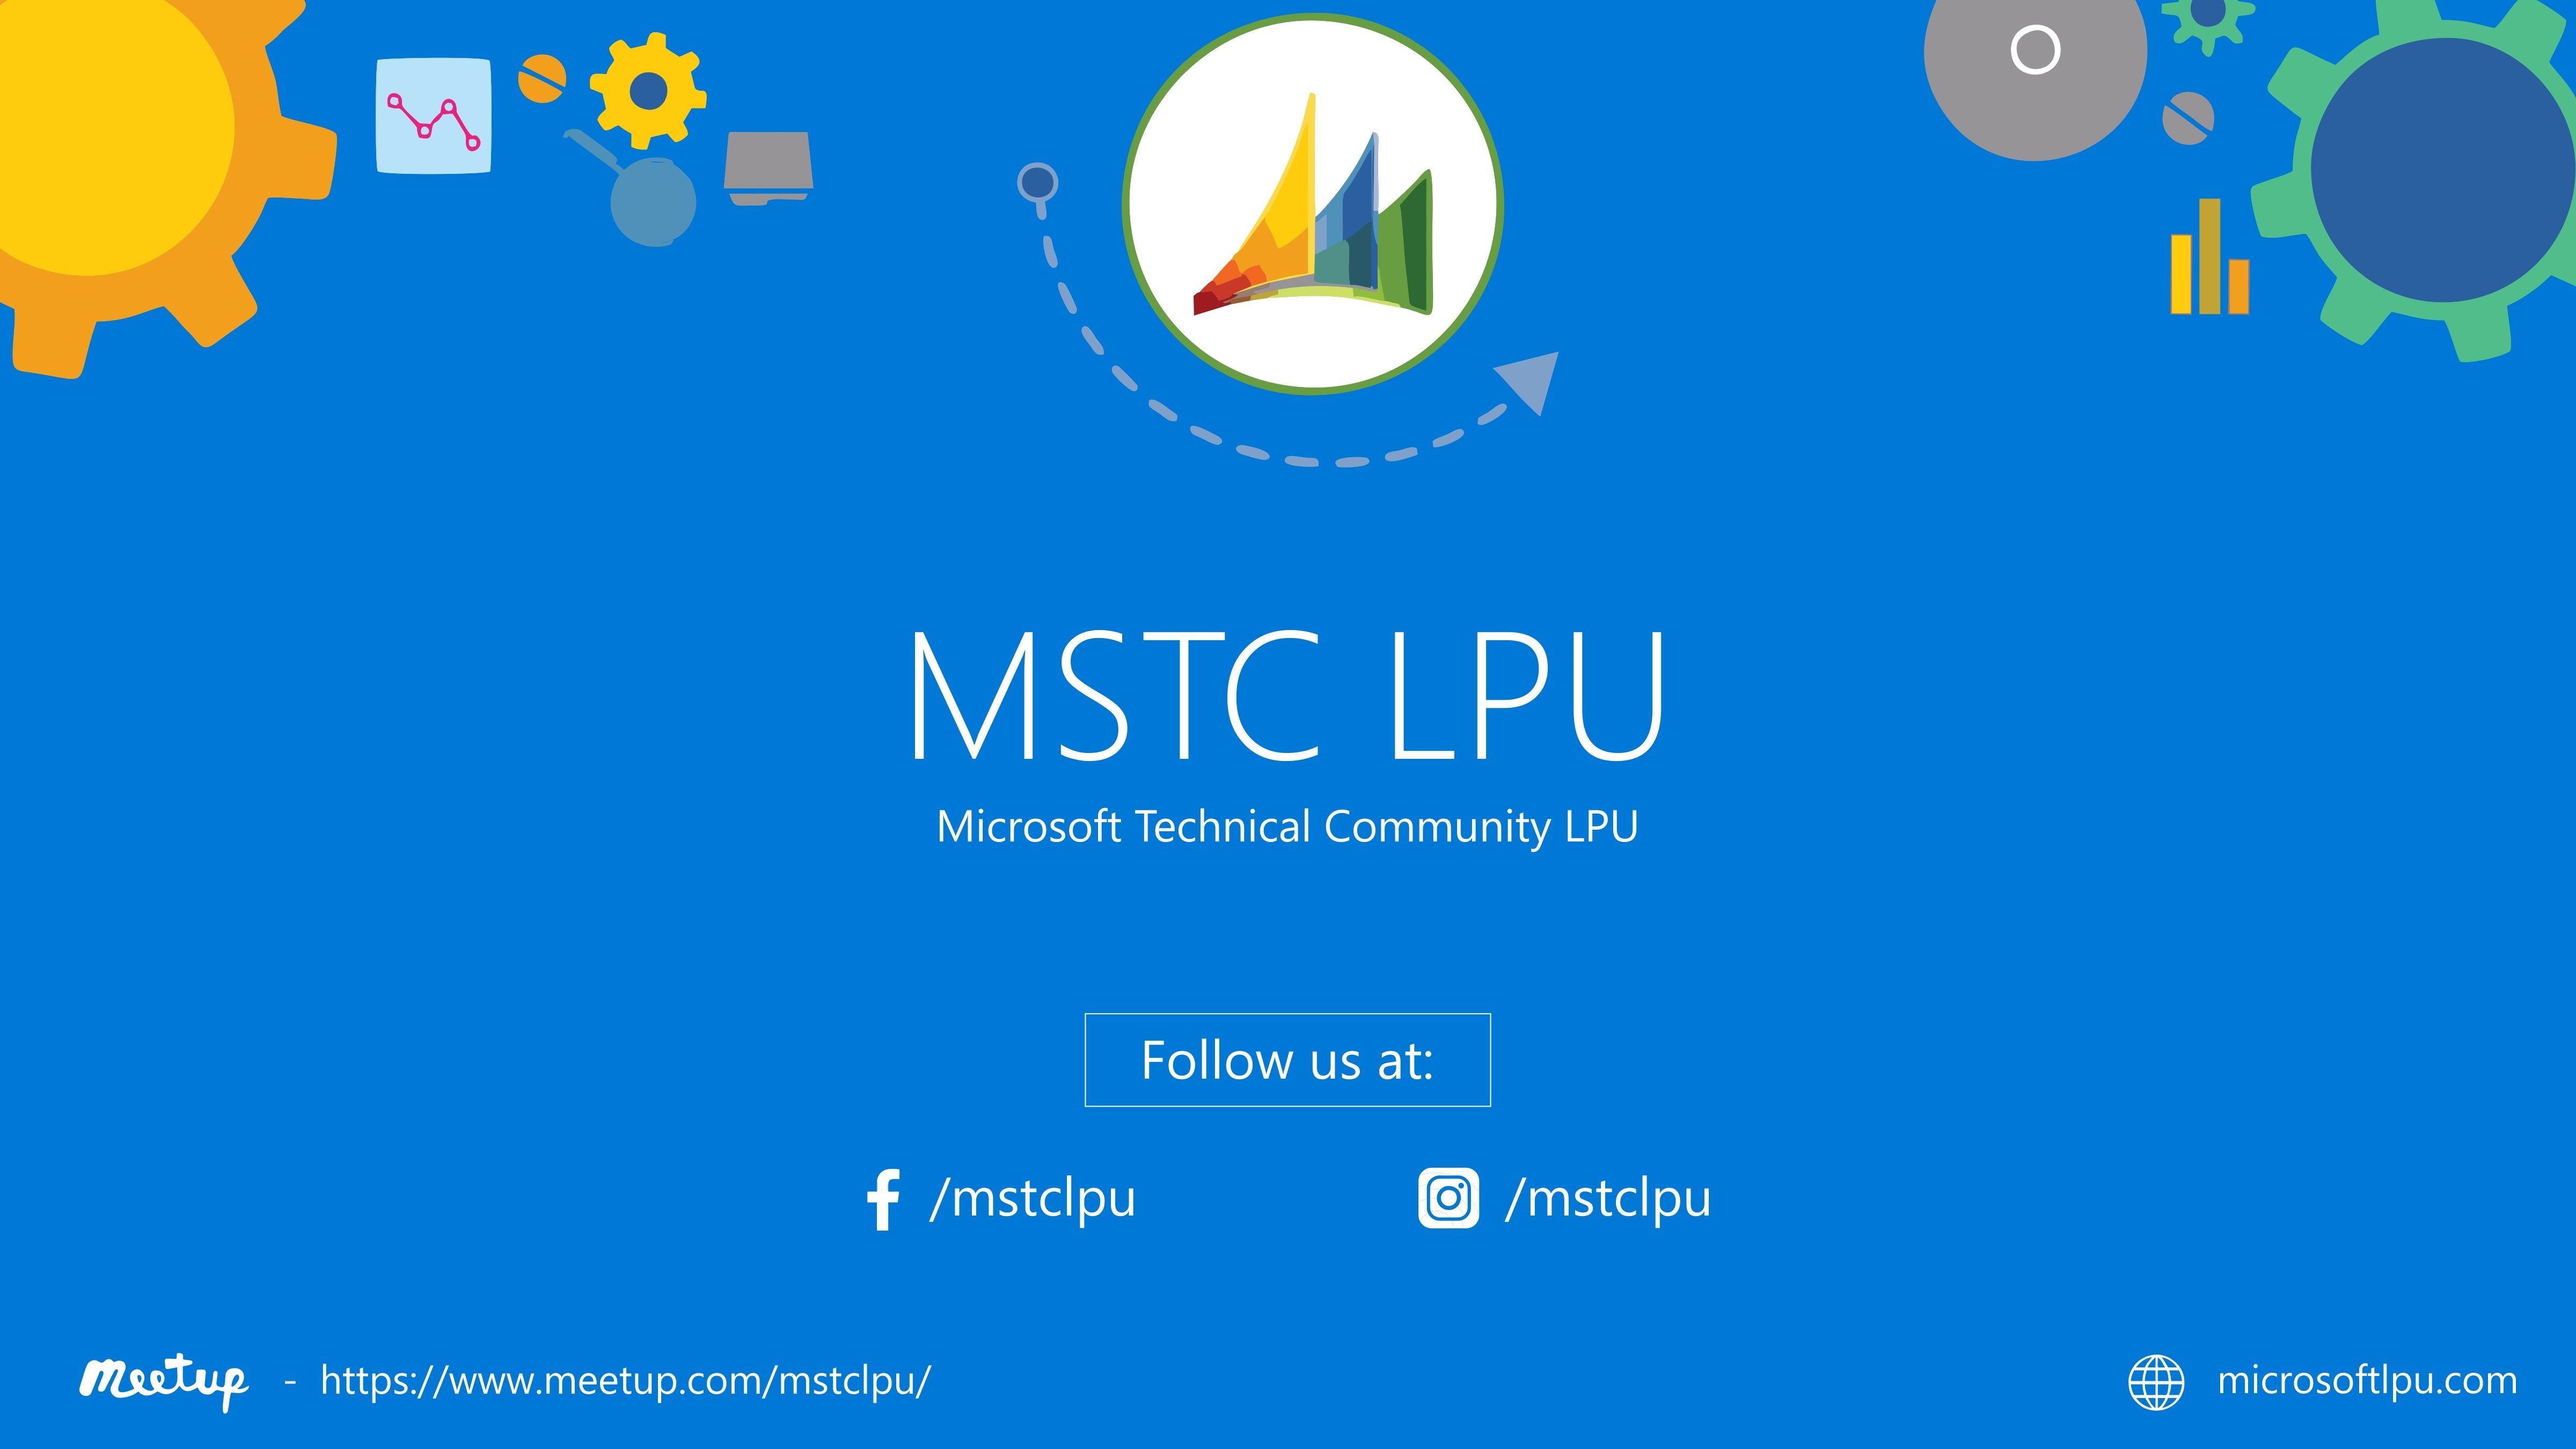 Microsoft Student Partner - LPU